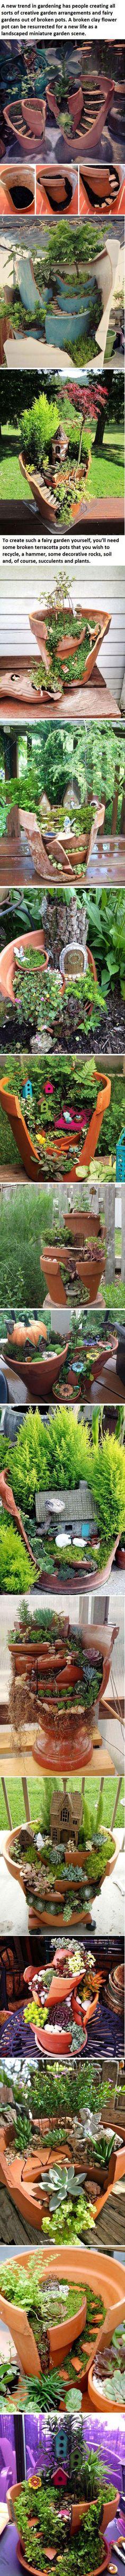 18 Broken Pots Turned Into Beautiful Fairy Gardens